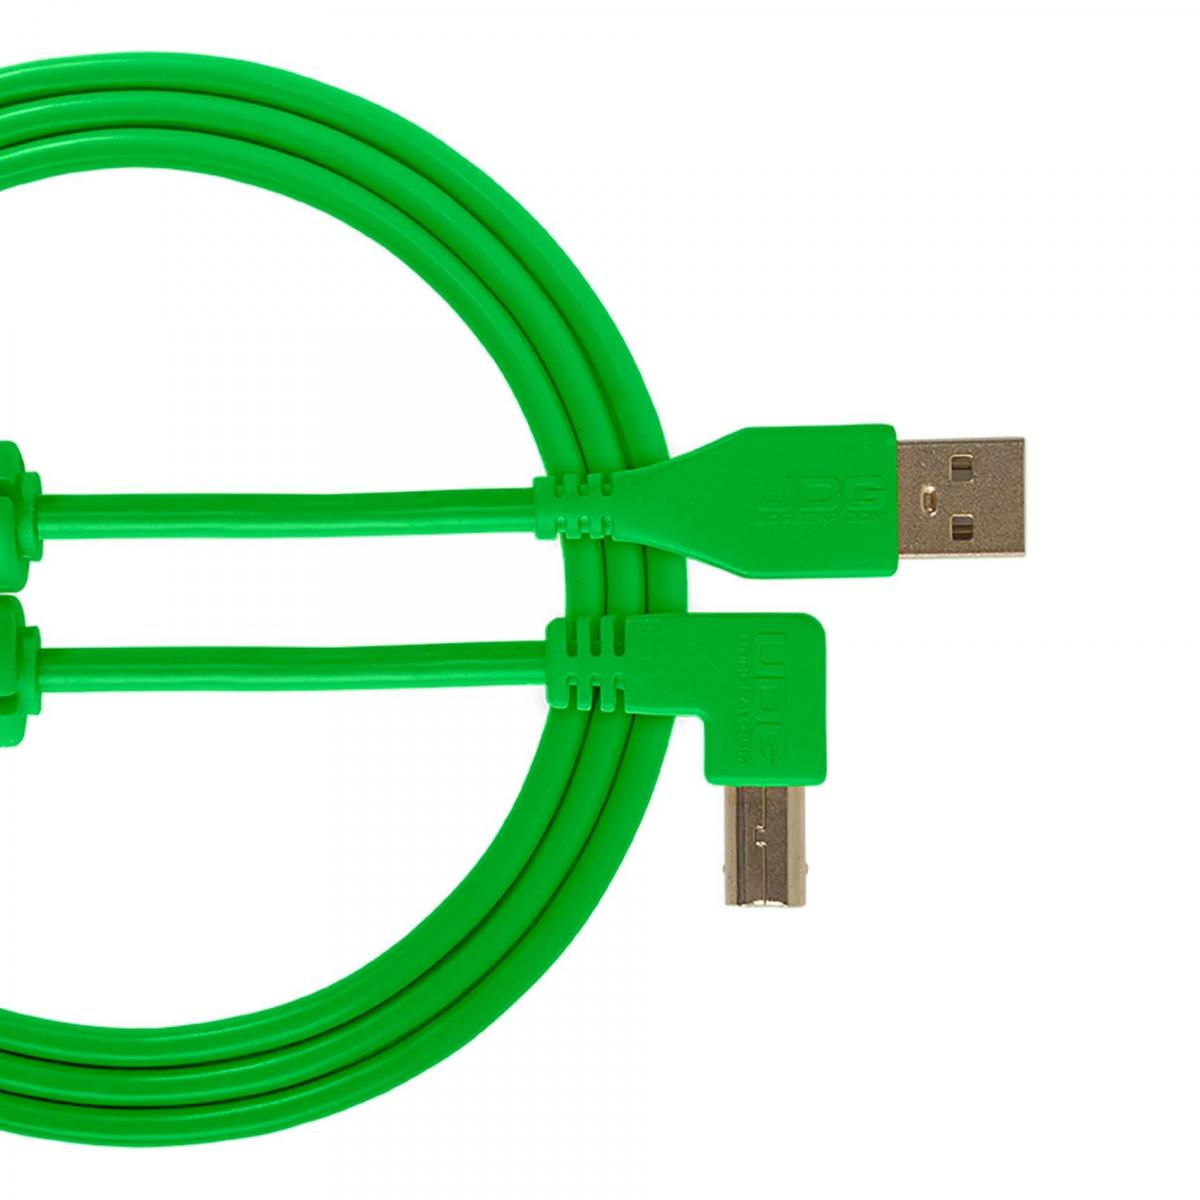 Câbles USB A vers B - UDG - U95006GR (3 mètres)